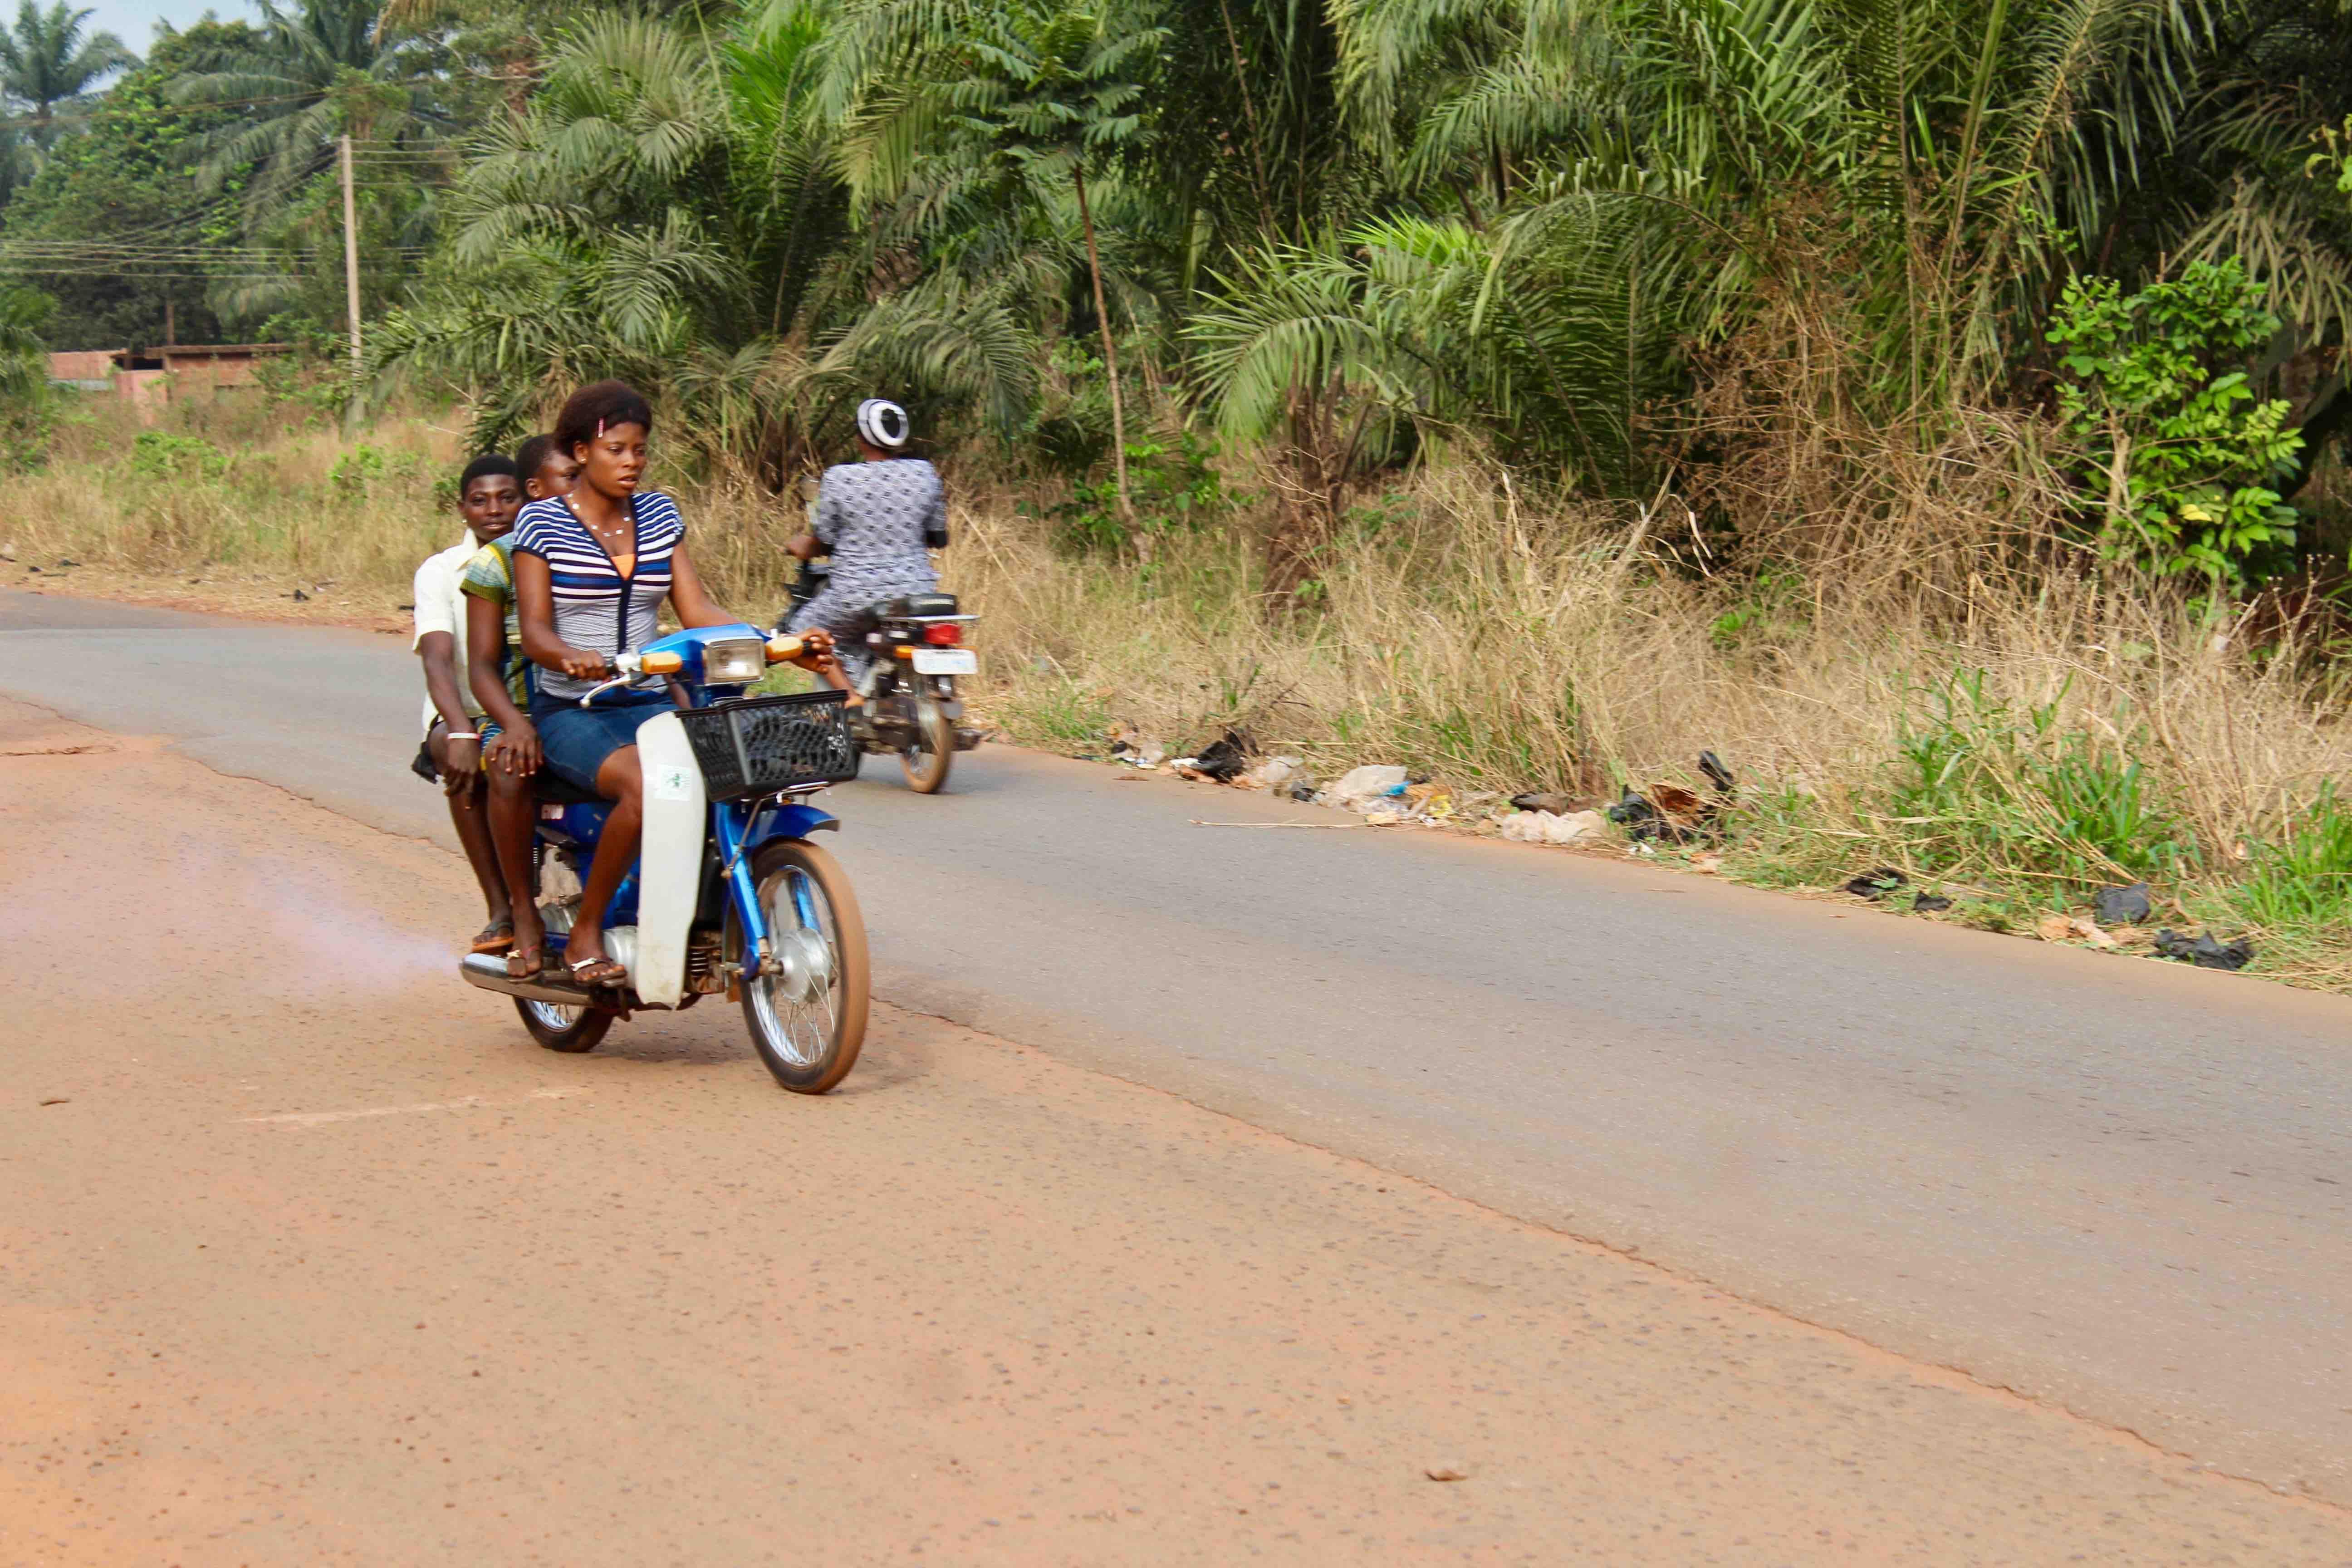 Igbo Girls, Motorcycling, Obolo Village, Enugu State, Nigeria. #JujuFilms